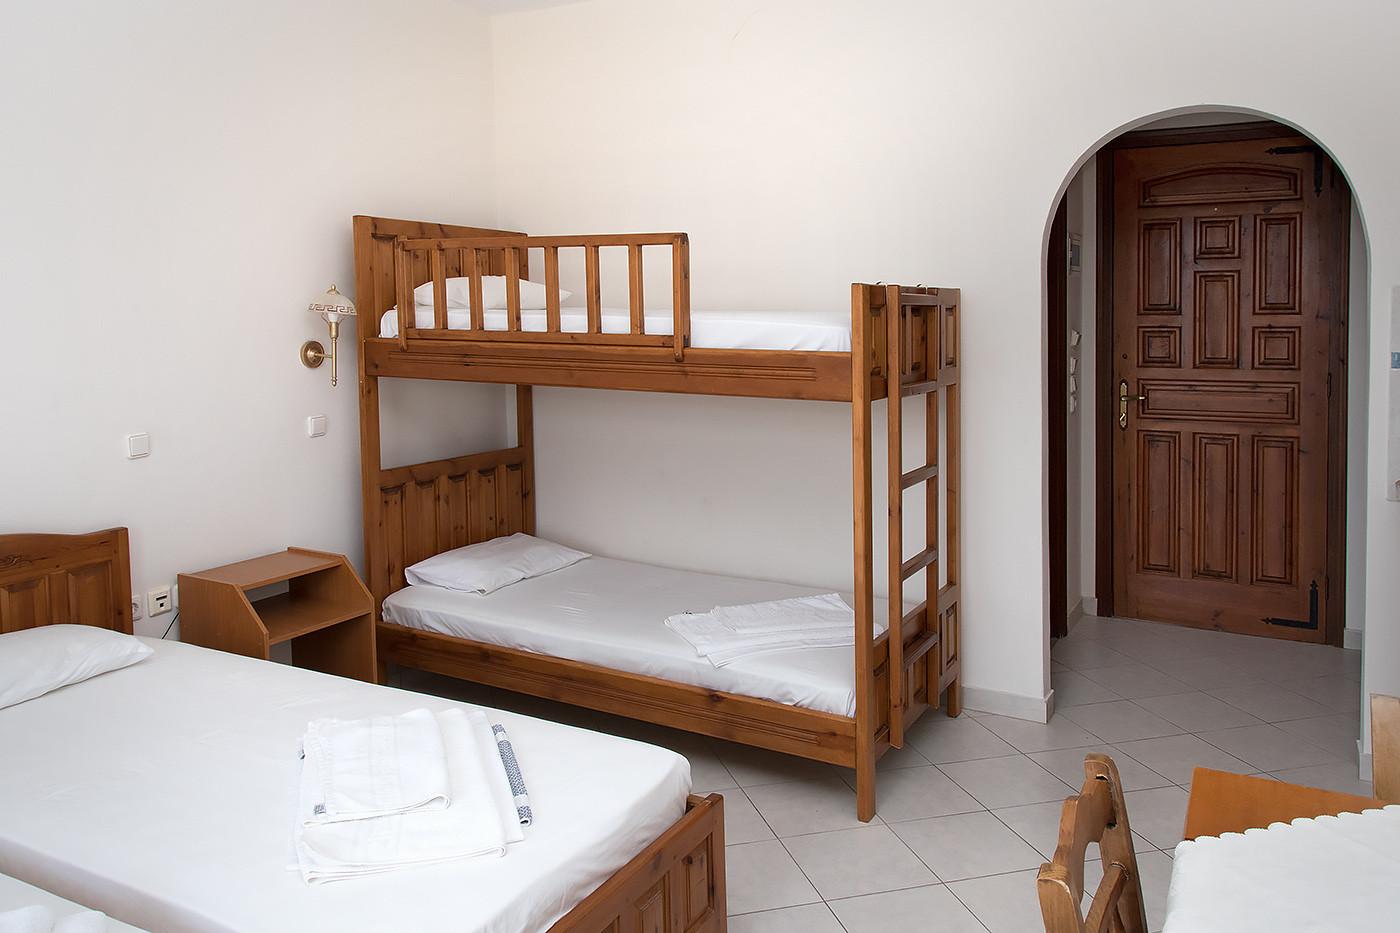 Hotel_Anemoesa_2018_002.jpg